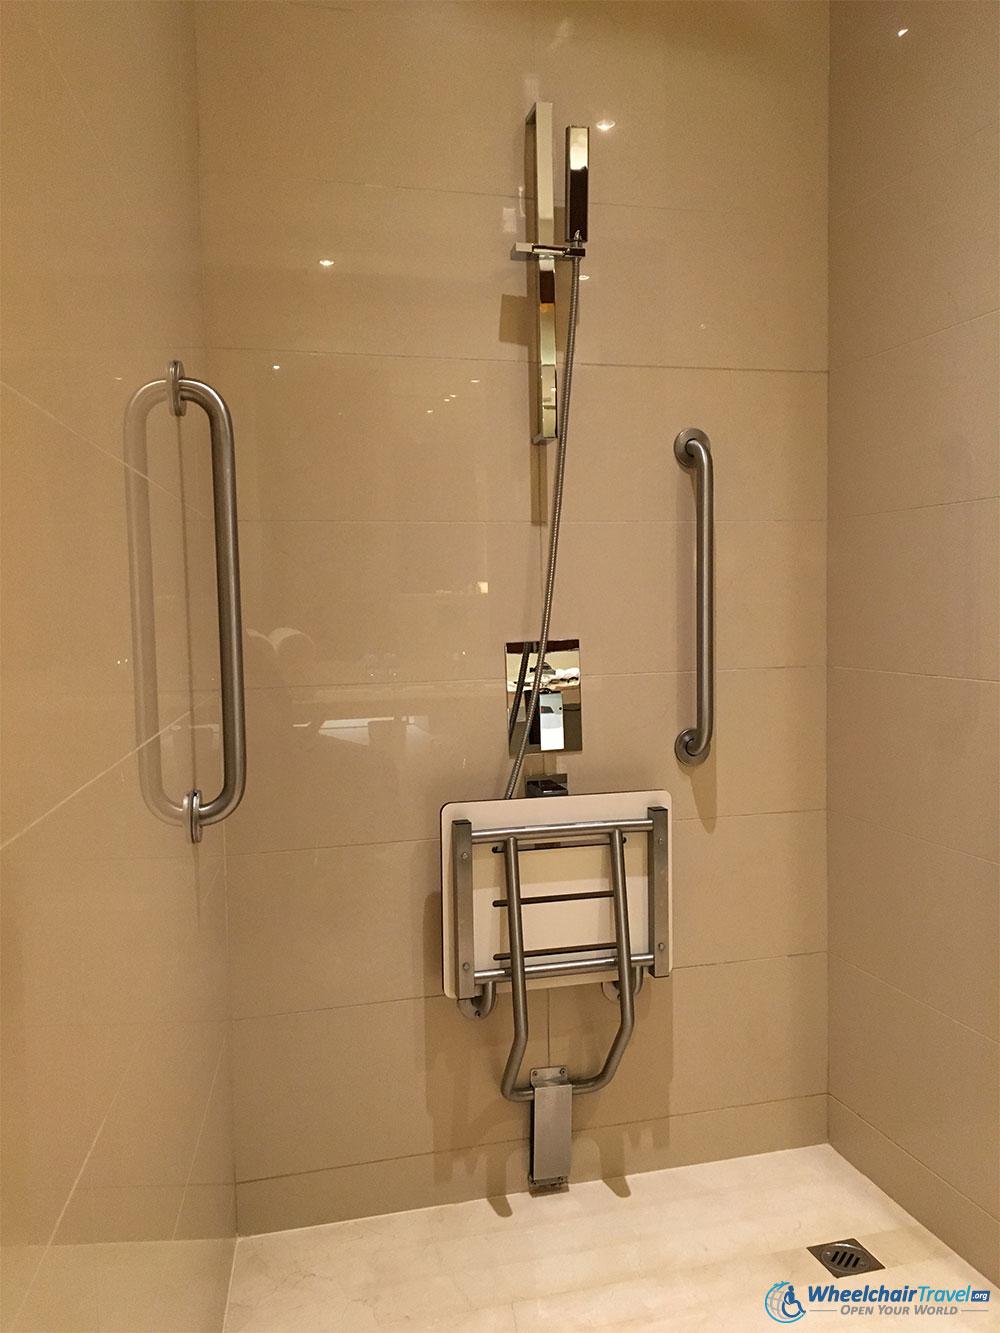 JW Marriott Marquis Dubai Wheelchair Accessible Roll-in Shower ...